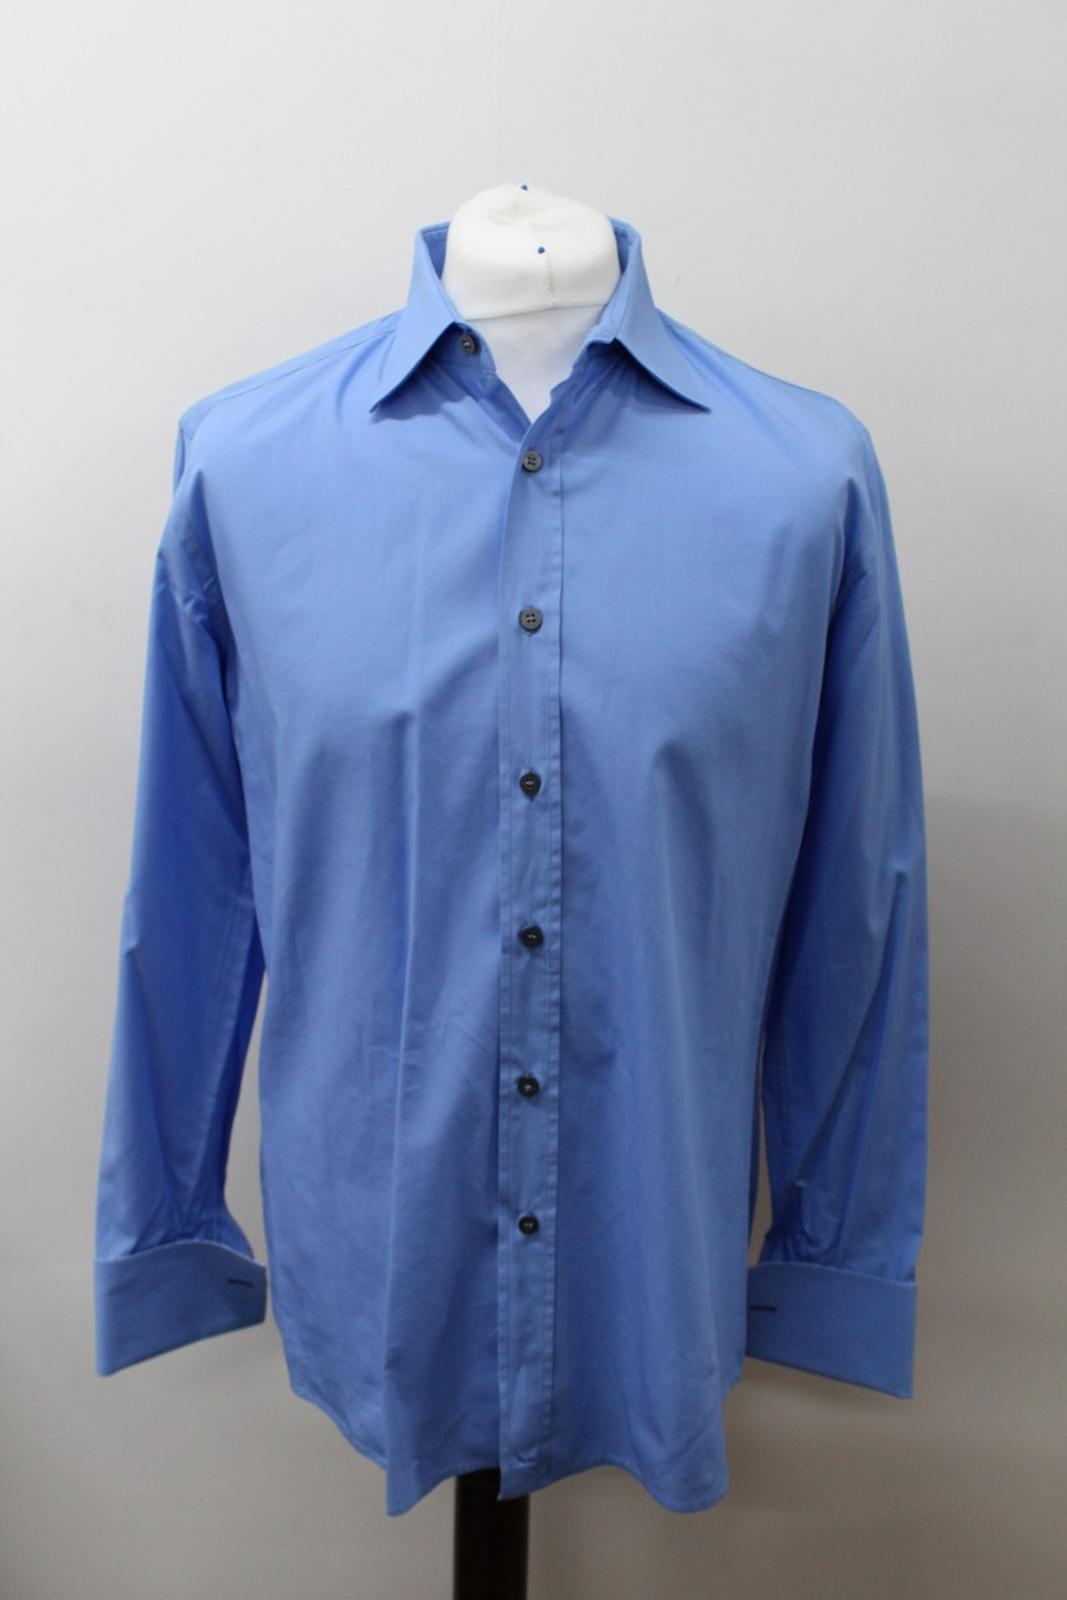 Paul-Smith-Hombres-Azul-Algodon-Mangas-Largas-Camisa-De-Puno-Doble-Cuello-16-5-034-42cm miniatura 7